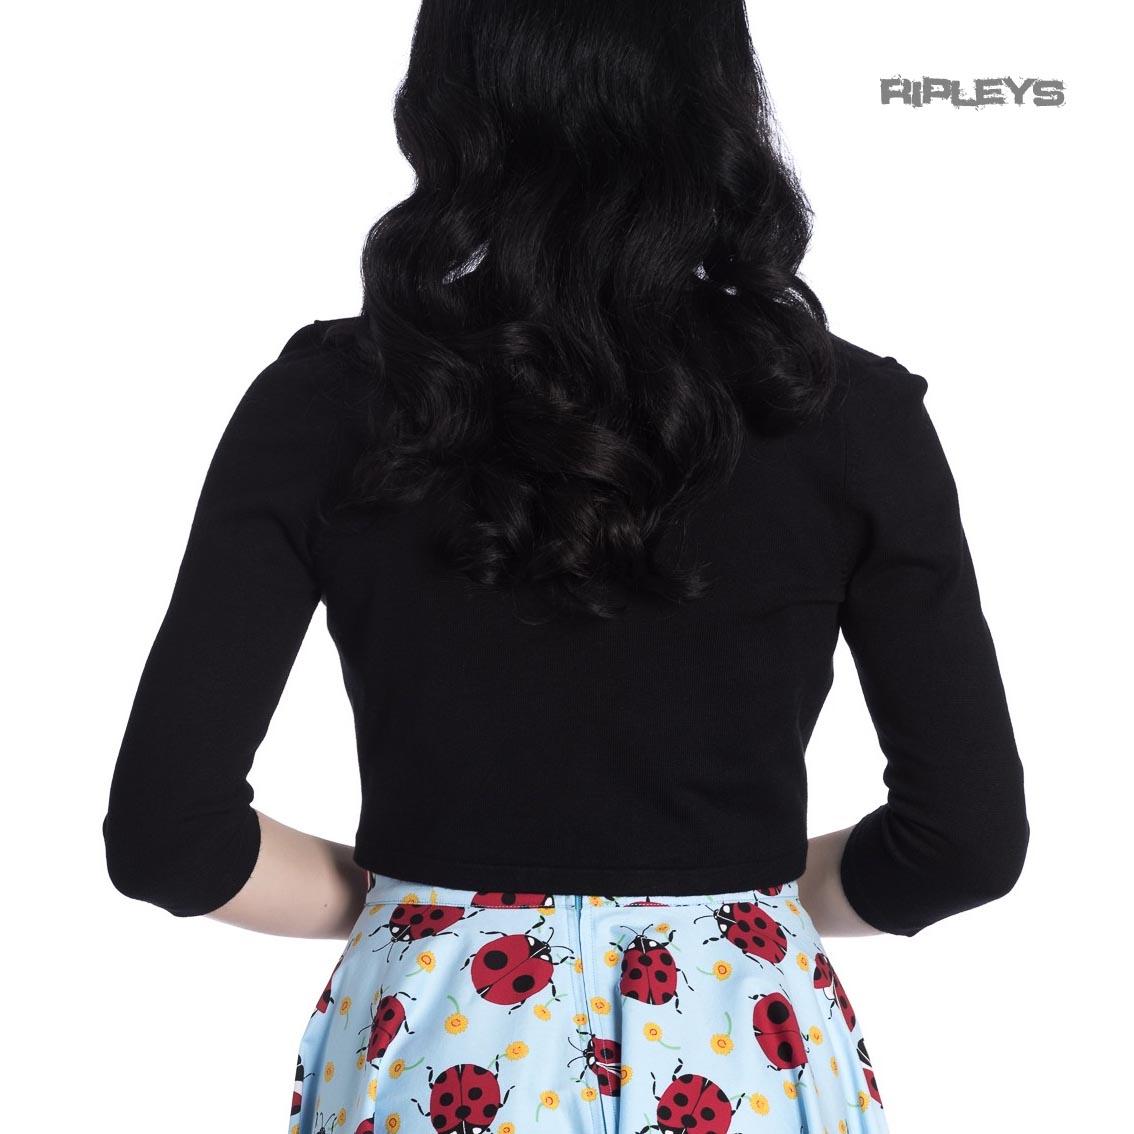 Hell Bunny Ladies 50s Plain Cardigan MAGGIE Bolero Top White Ivory All Sizes